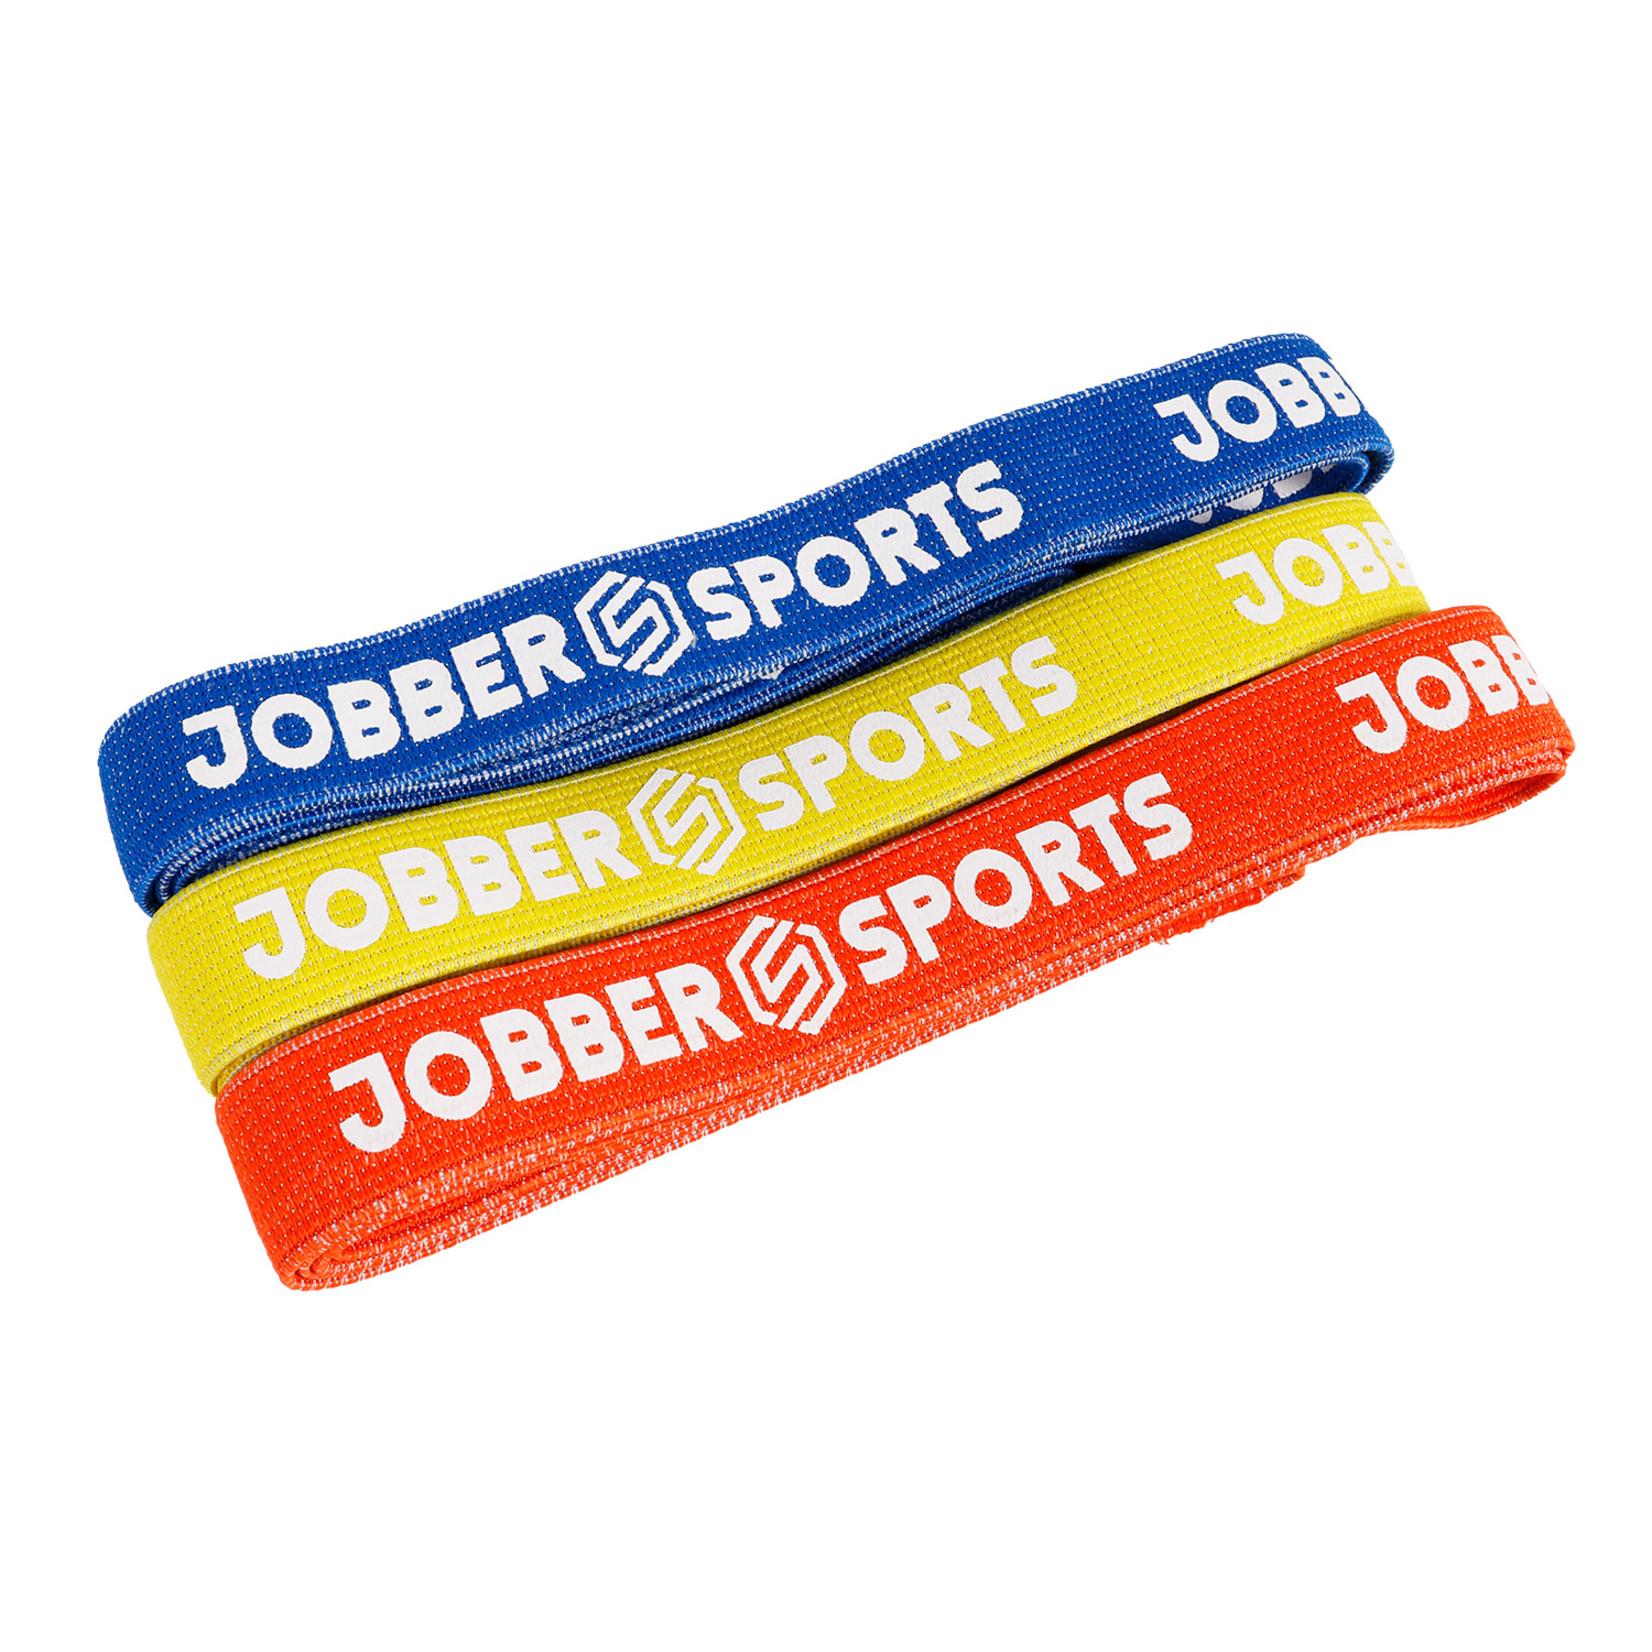 Jobber Fitness Jobber Sports Weerstandsband geel 10 kg (extra light)